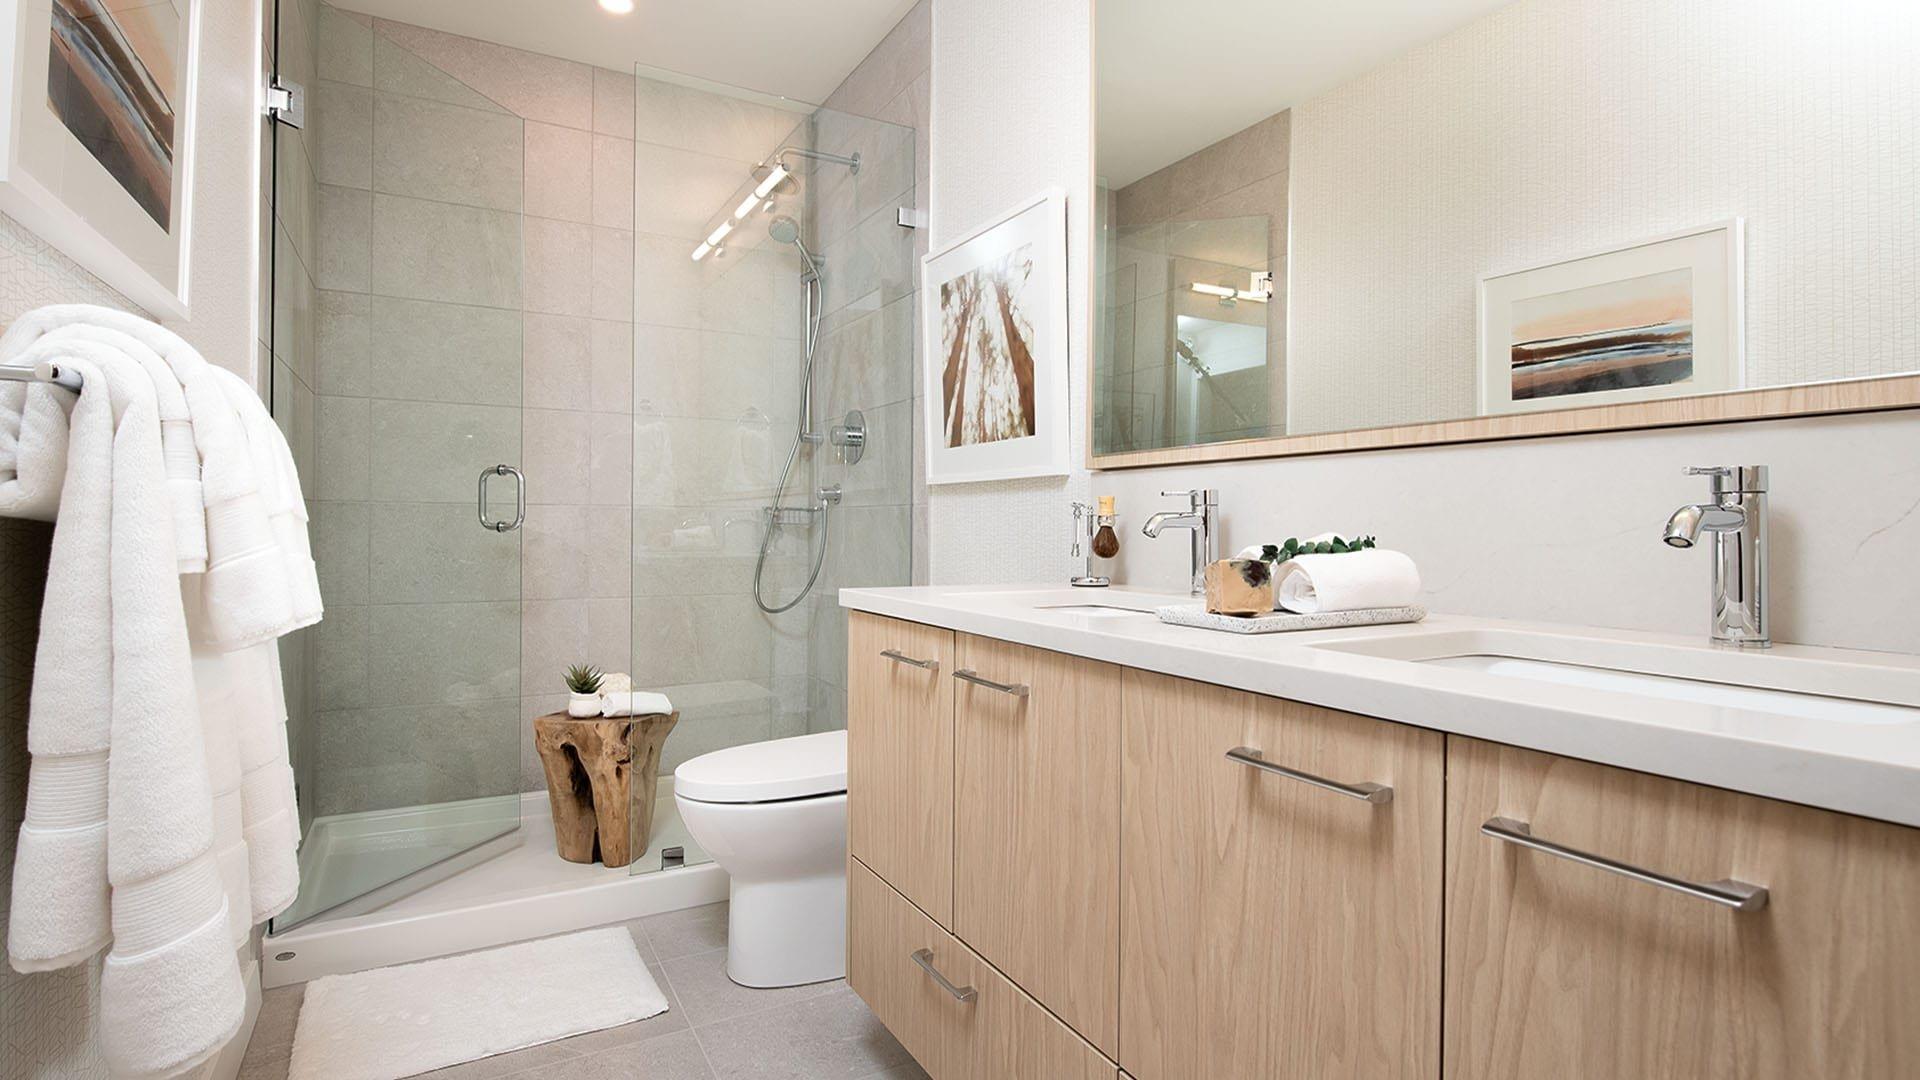 Bathroom - 3182 Gladwin Rd, Abbotsford, BC V0V 0V0,Canada!